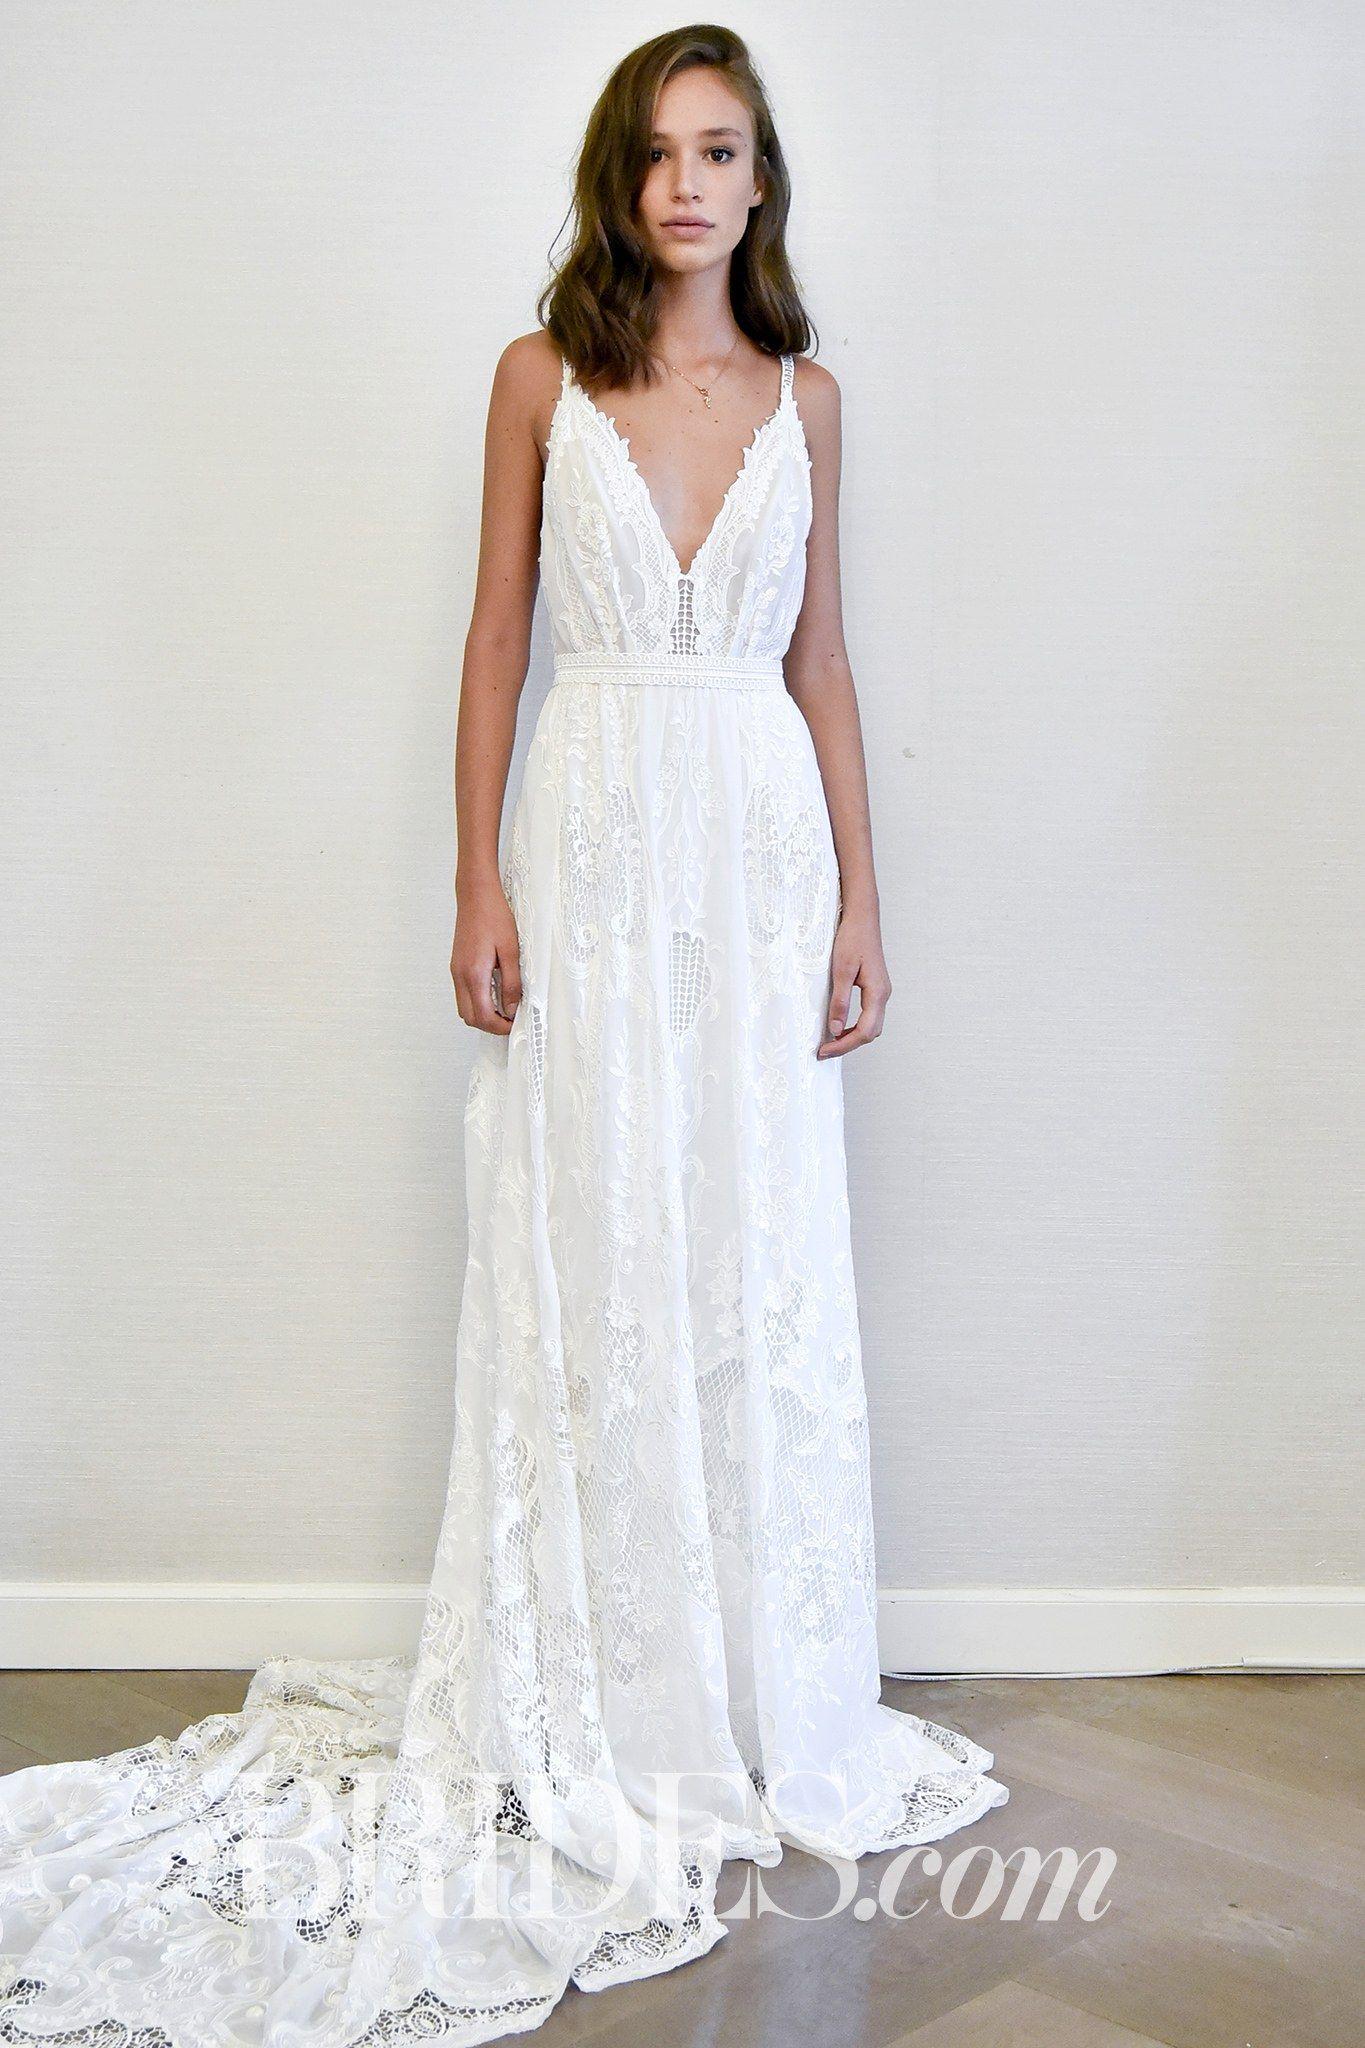 26 Wedding Guest Dresses For Spring Weddings Womens Wedding Dresses Ball Gowns Wedding Flora Bridal